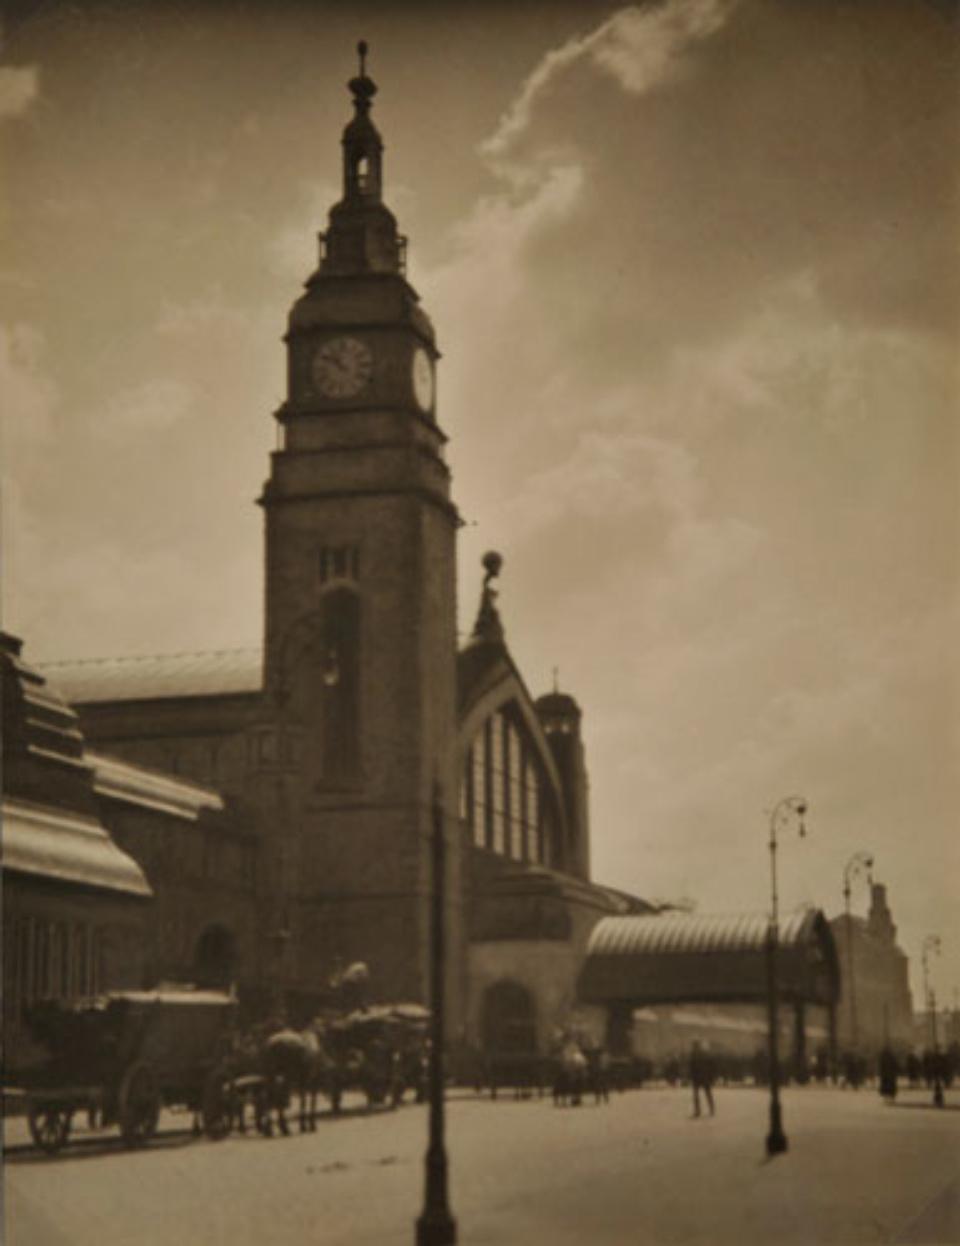 E.O. Hoppé Hamburg Central Station, 1925 Vintage gelatin silver print